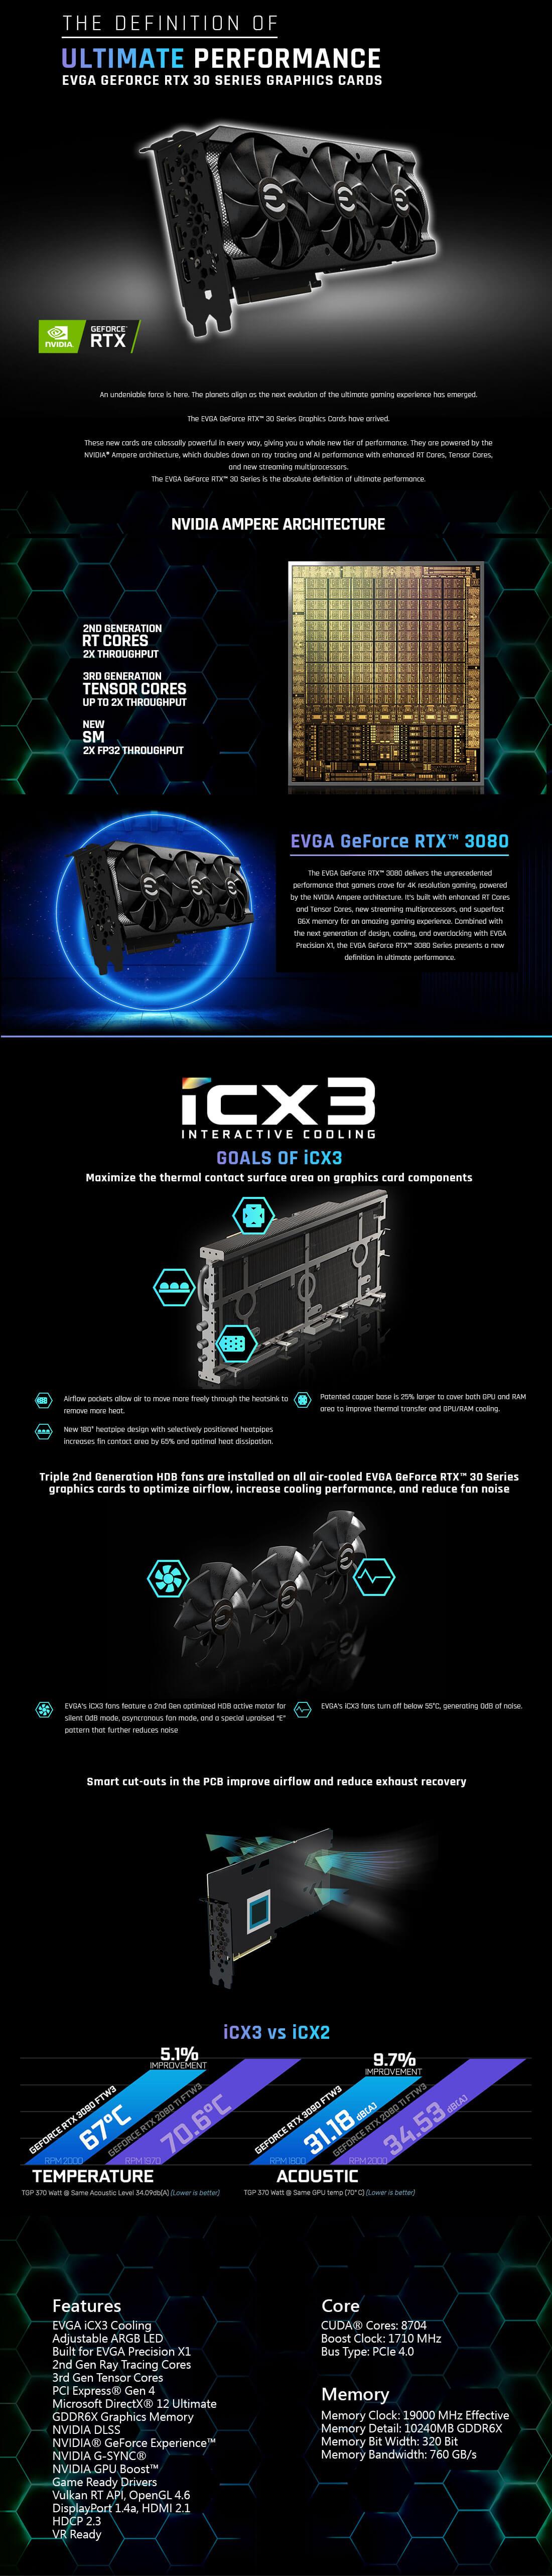 EVGA GeForce RTX™ 3070 XC3 ULTRA GAMING - 8GB GDDR6 (Sao chép)